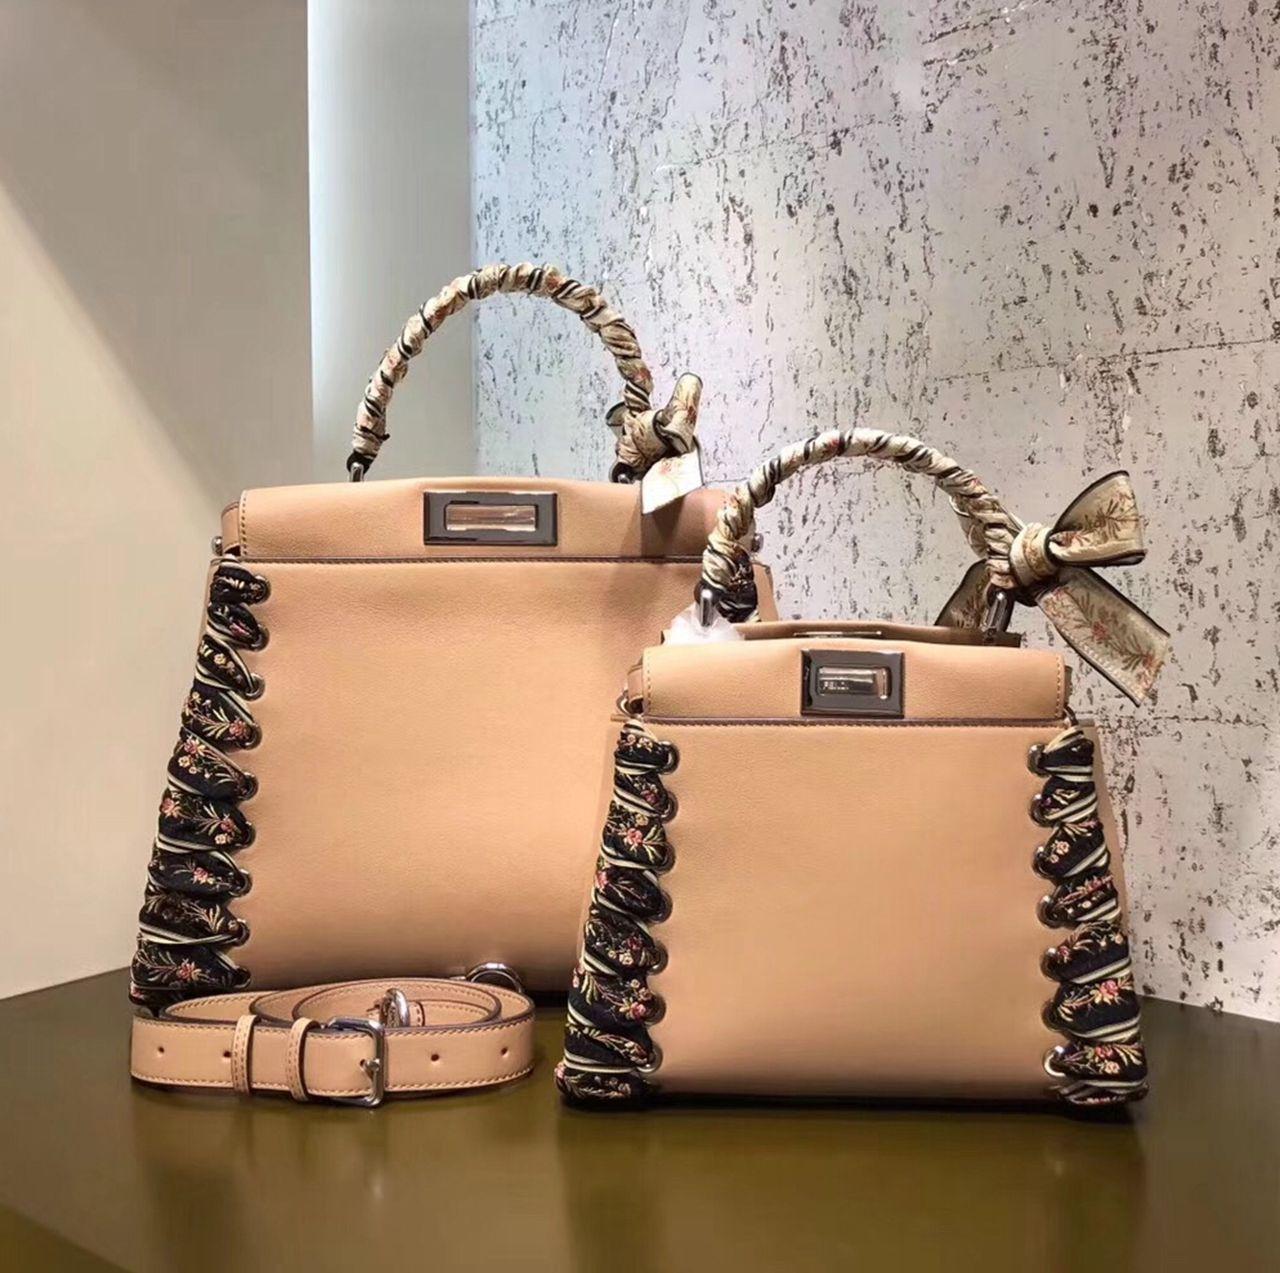 d53b38311e464 Fendi Peekaboo Small Regular Bag With Fabric Weave Apricot 2017 ...